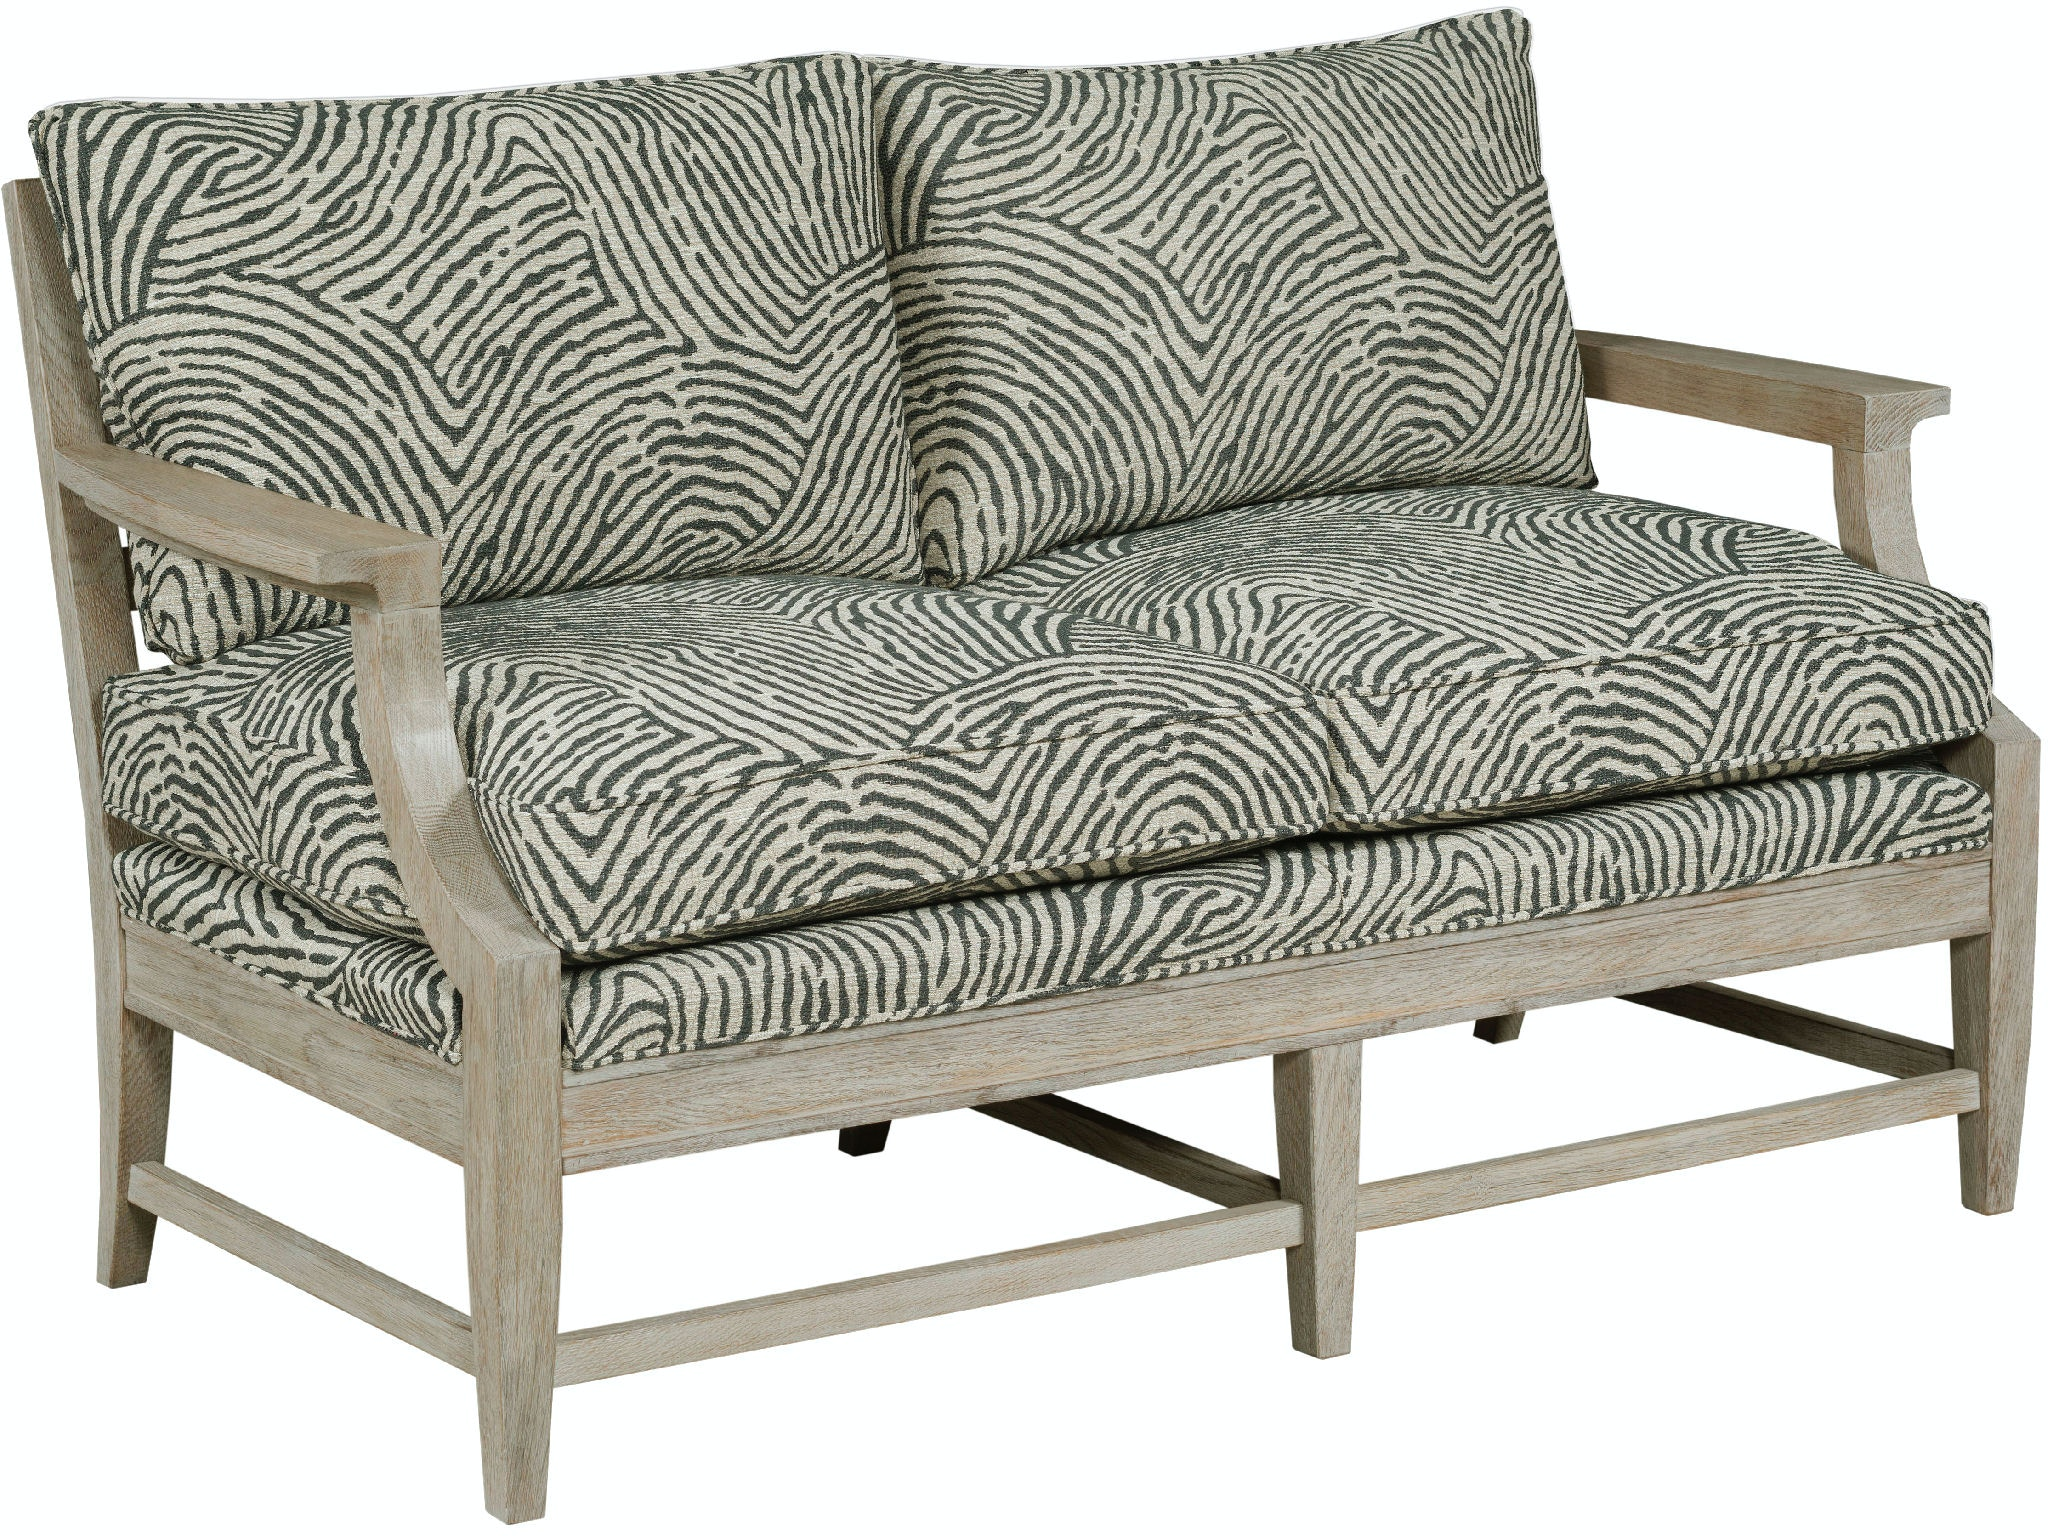 Kincaid Furniture Settee 018 05S